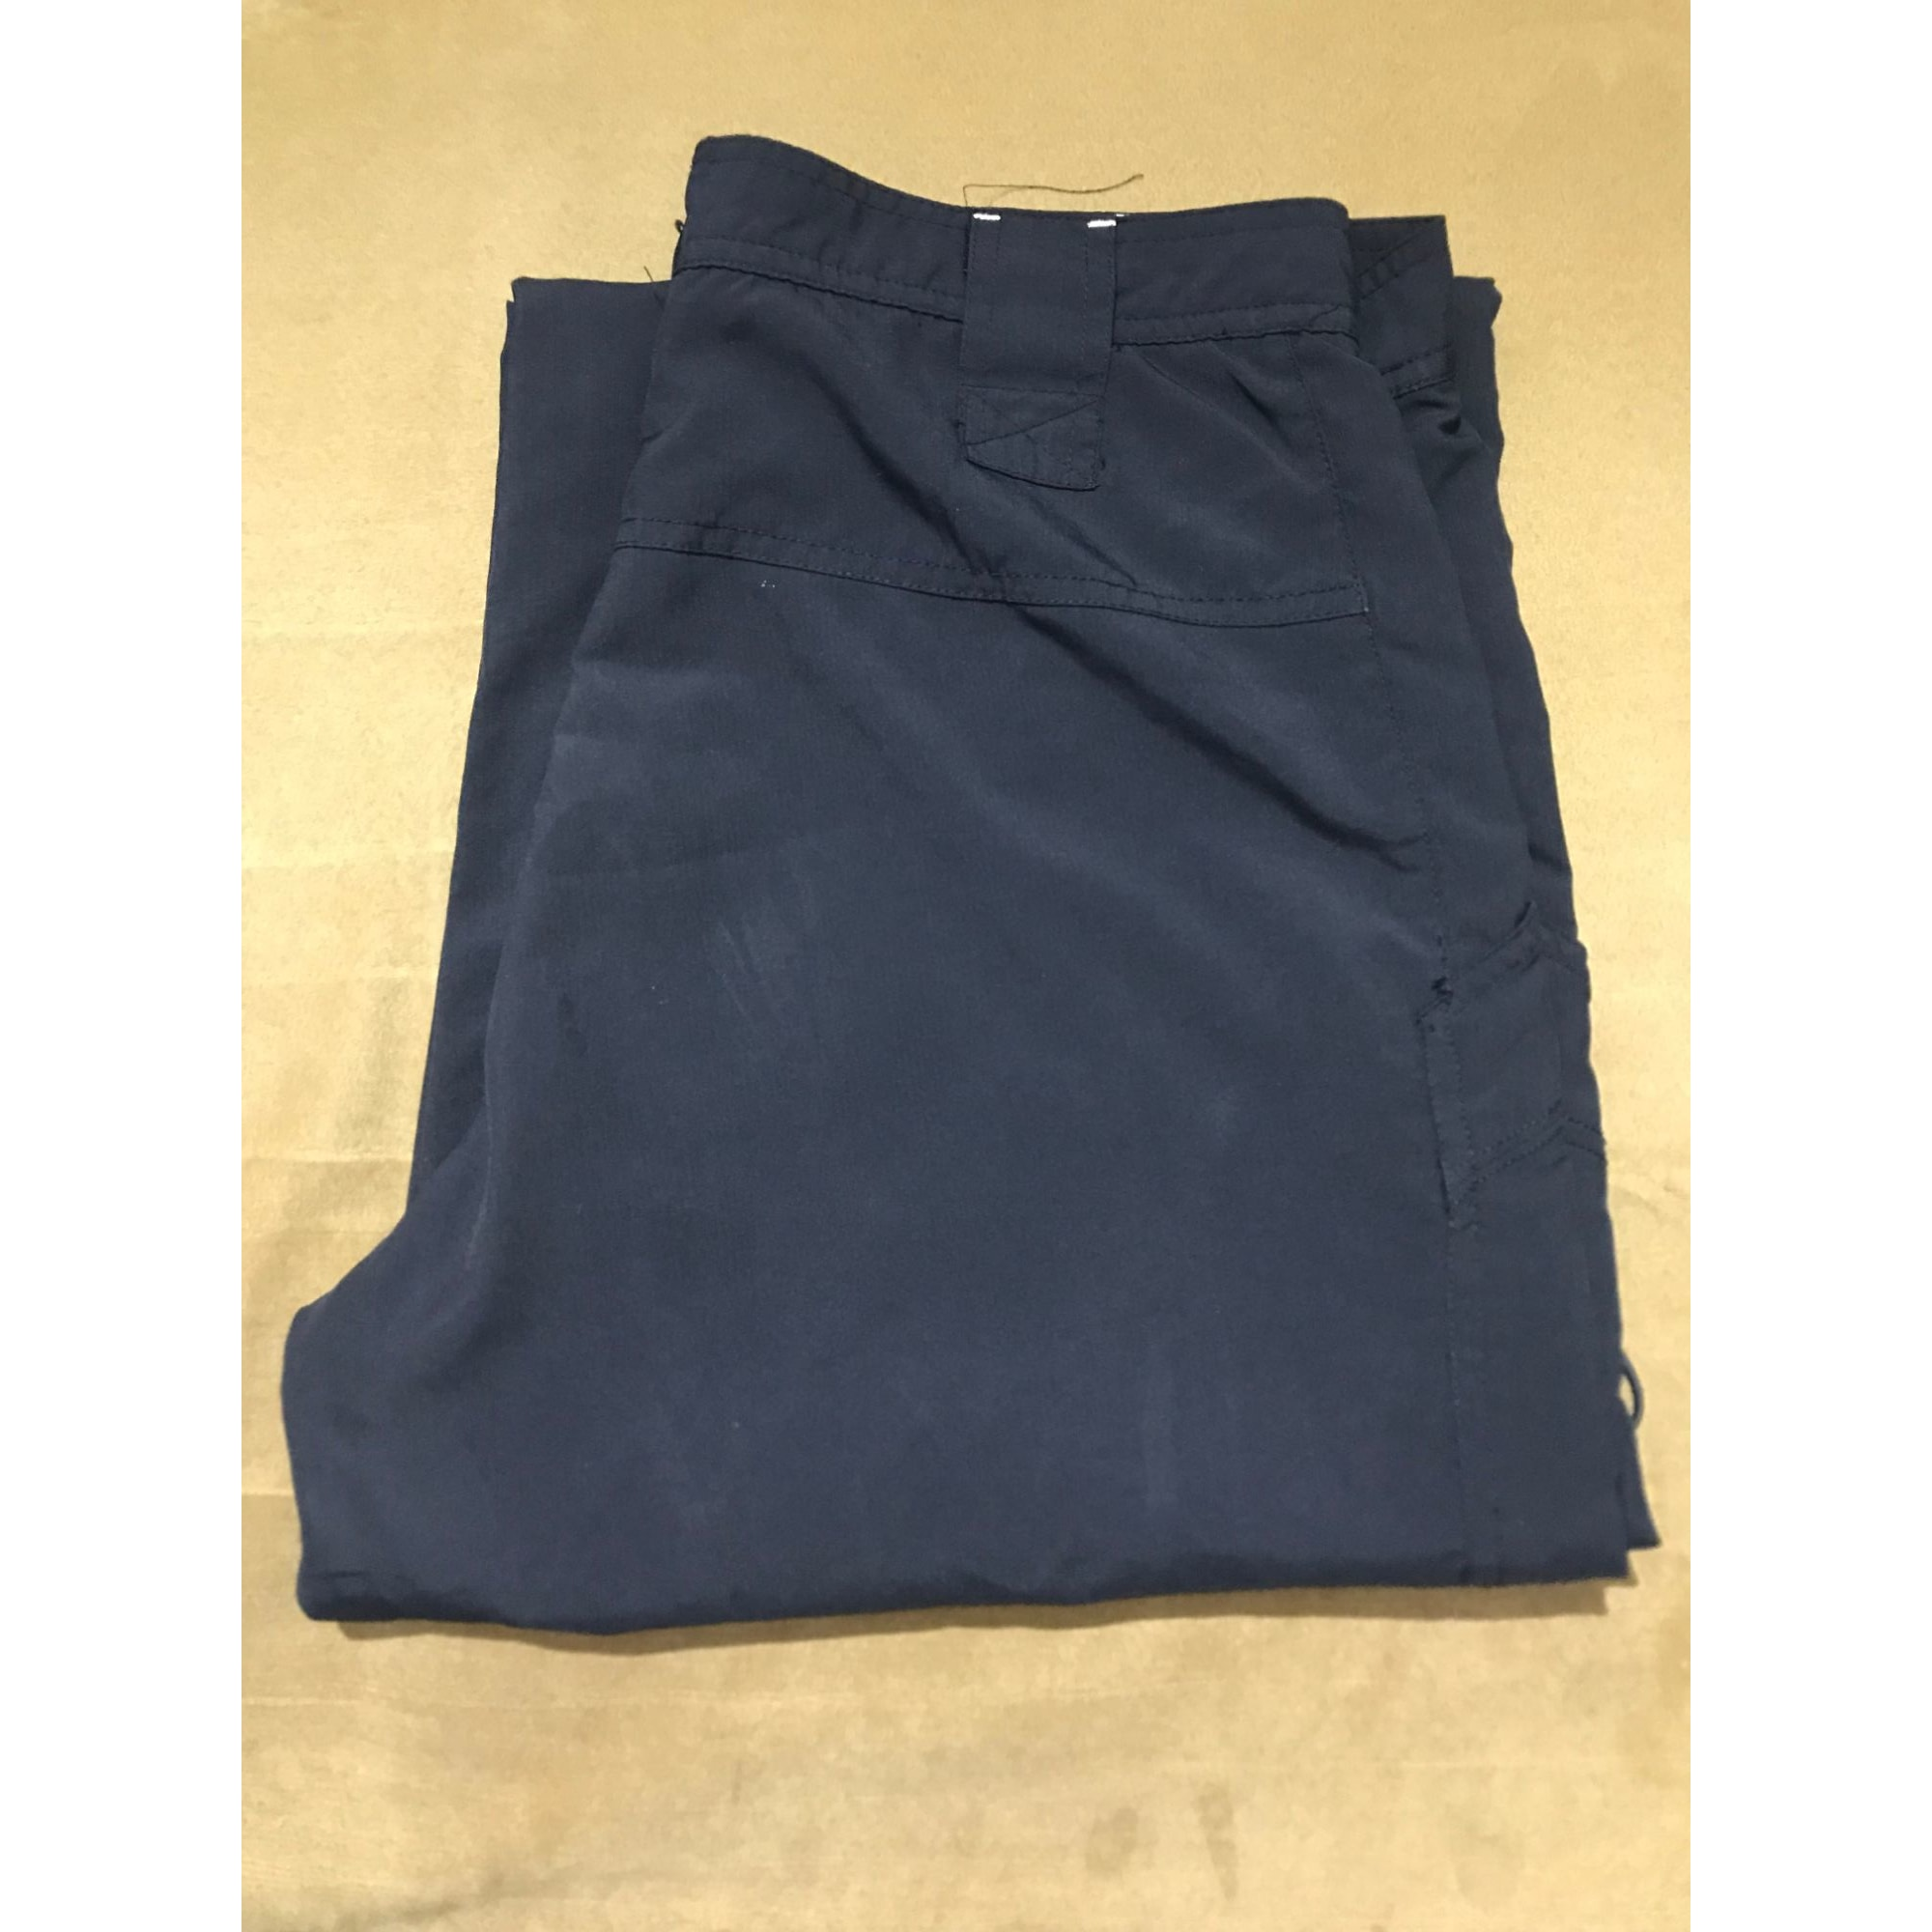 Pantalon de survêtement PUMA Bleu, bleu marine, bleu turquoise